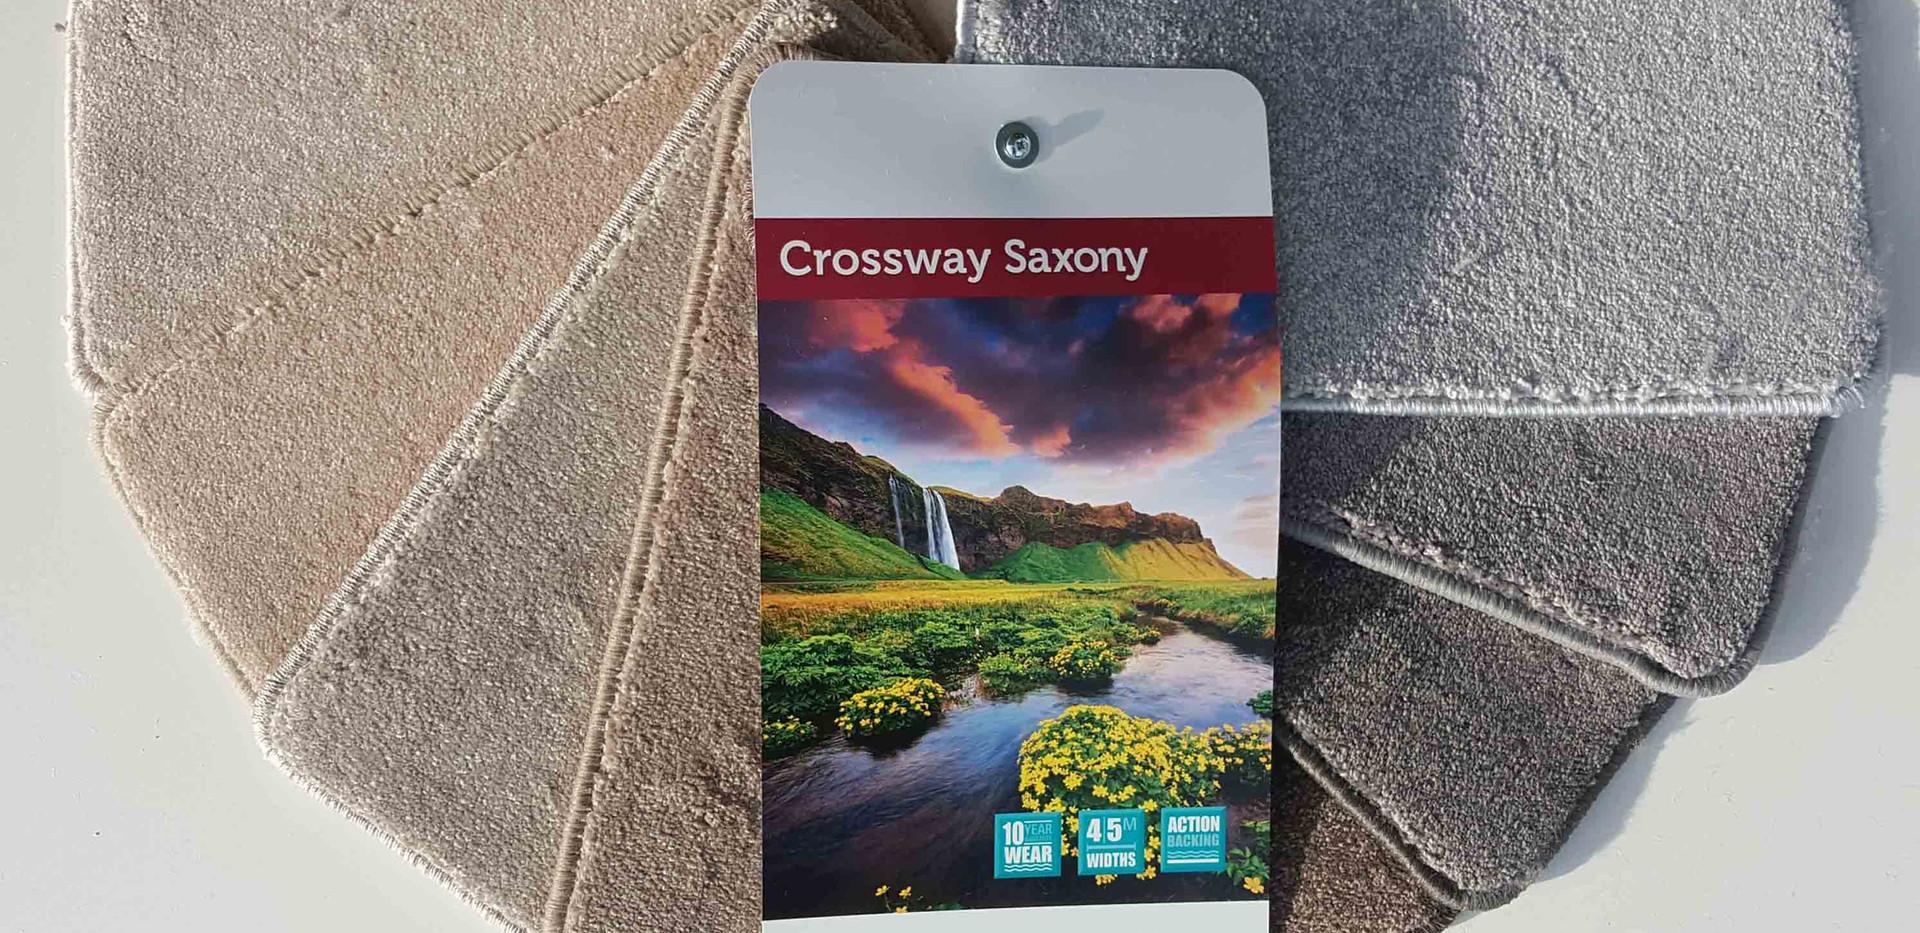 Crossway Saxony Carpet